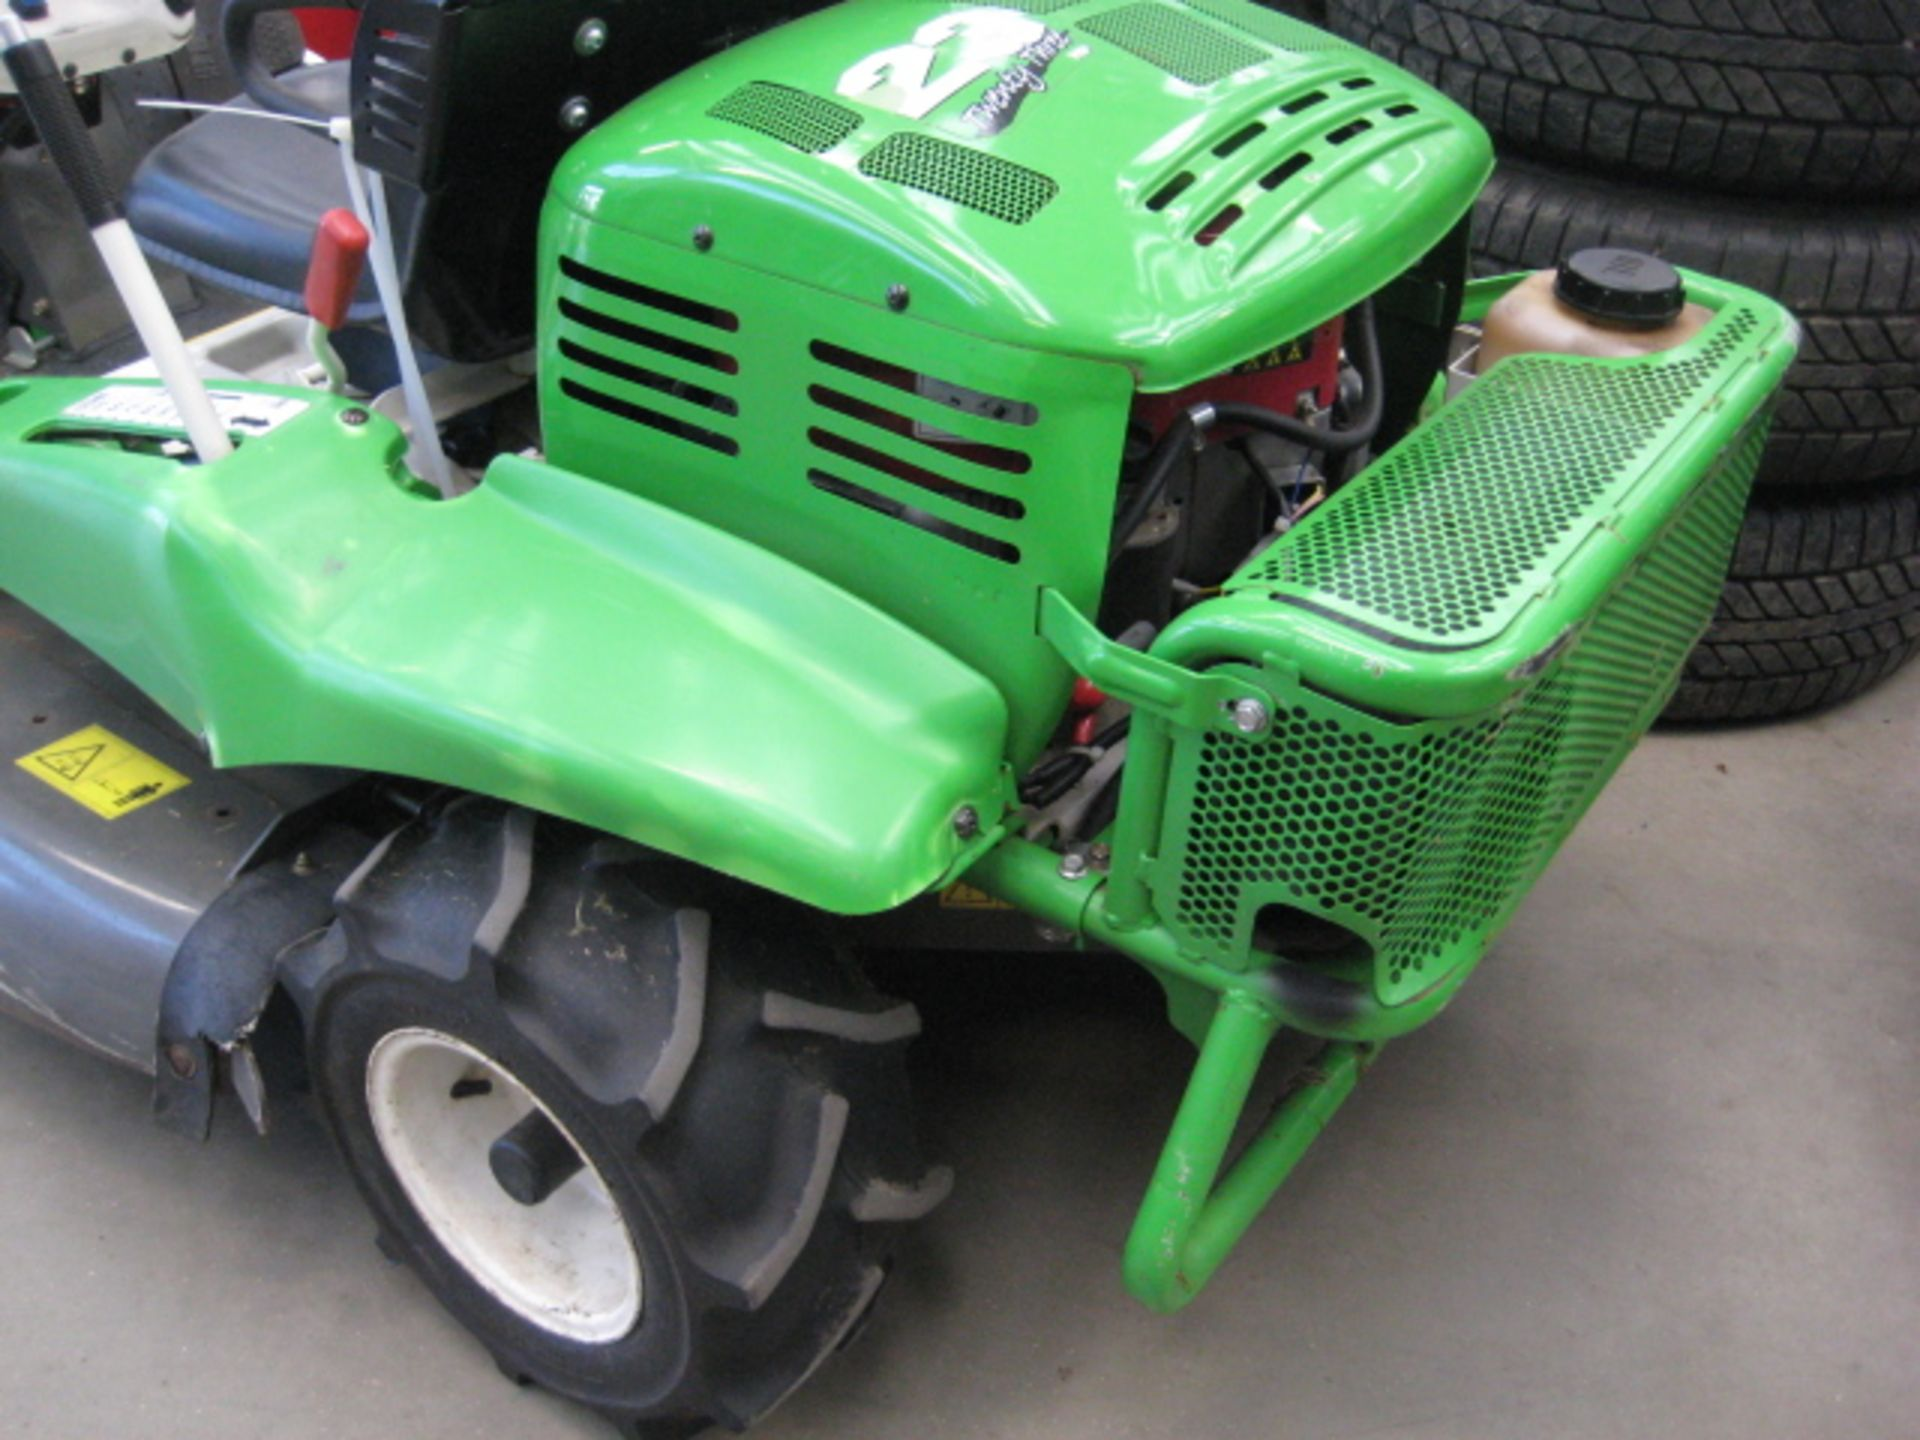 Lot 4025 - Etessia AV98X 4x4 hydrostatic rough cut mower (2016), 40'' rotary cut, Briggs & Stratton 23hp V-Twin